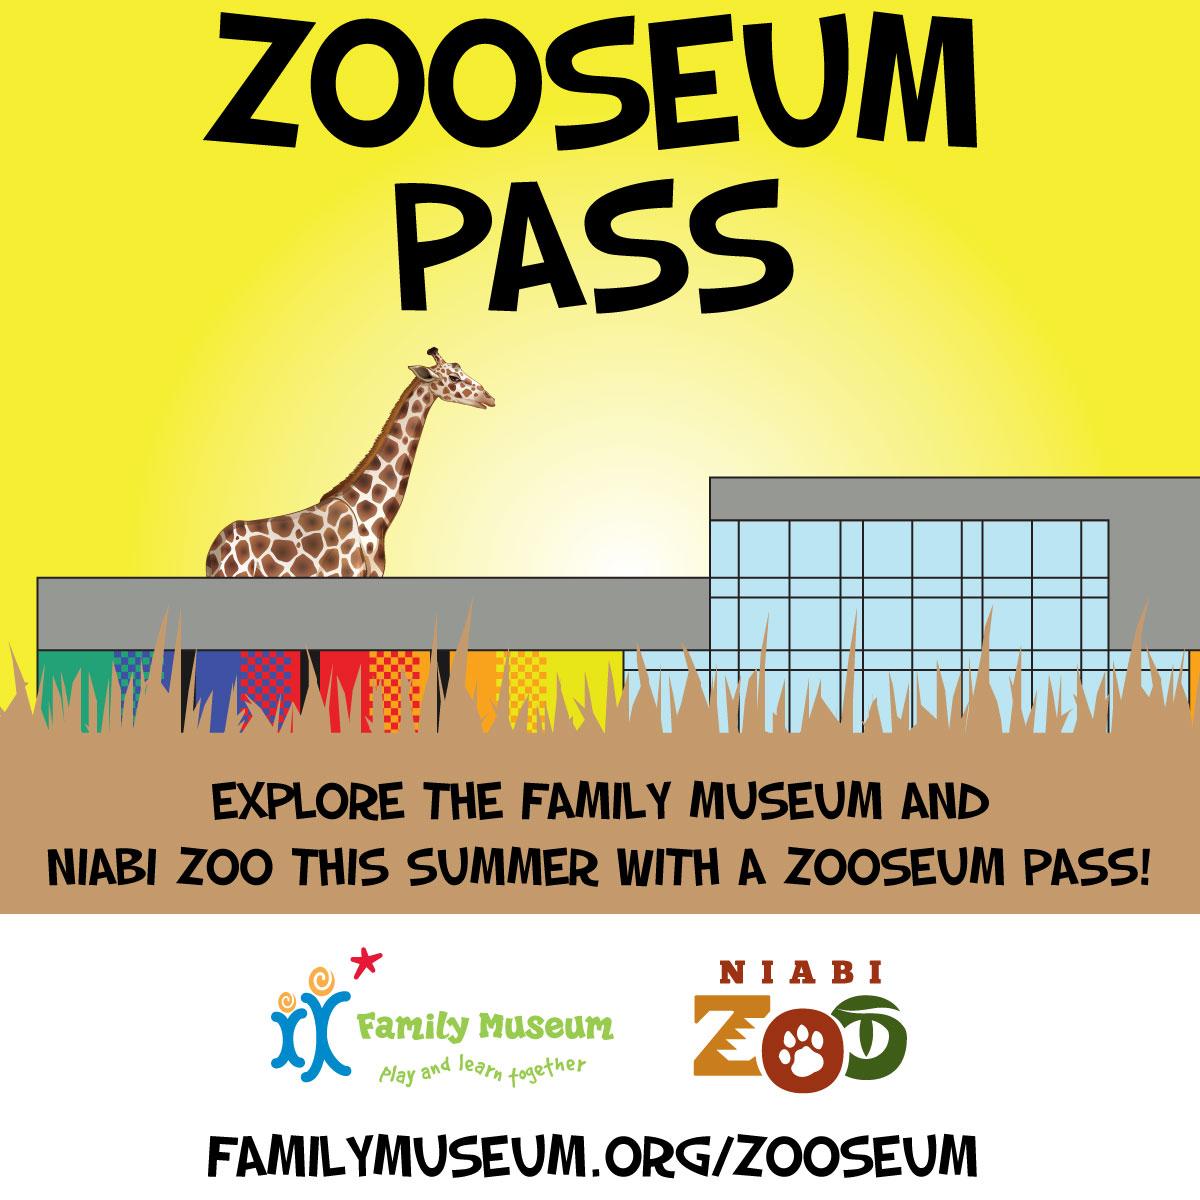 Zooseum 2020